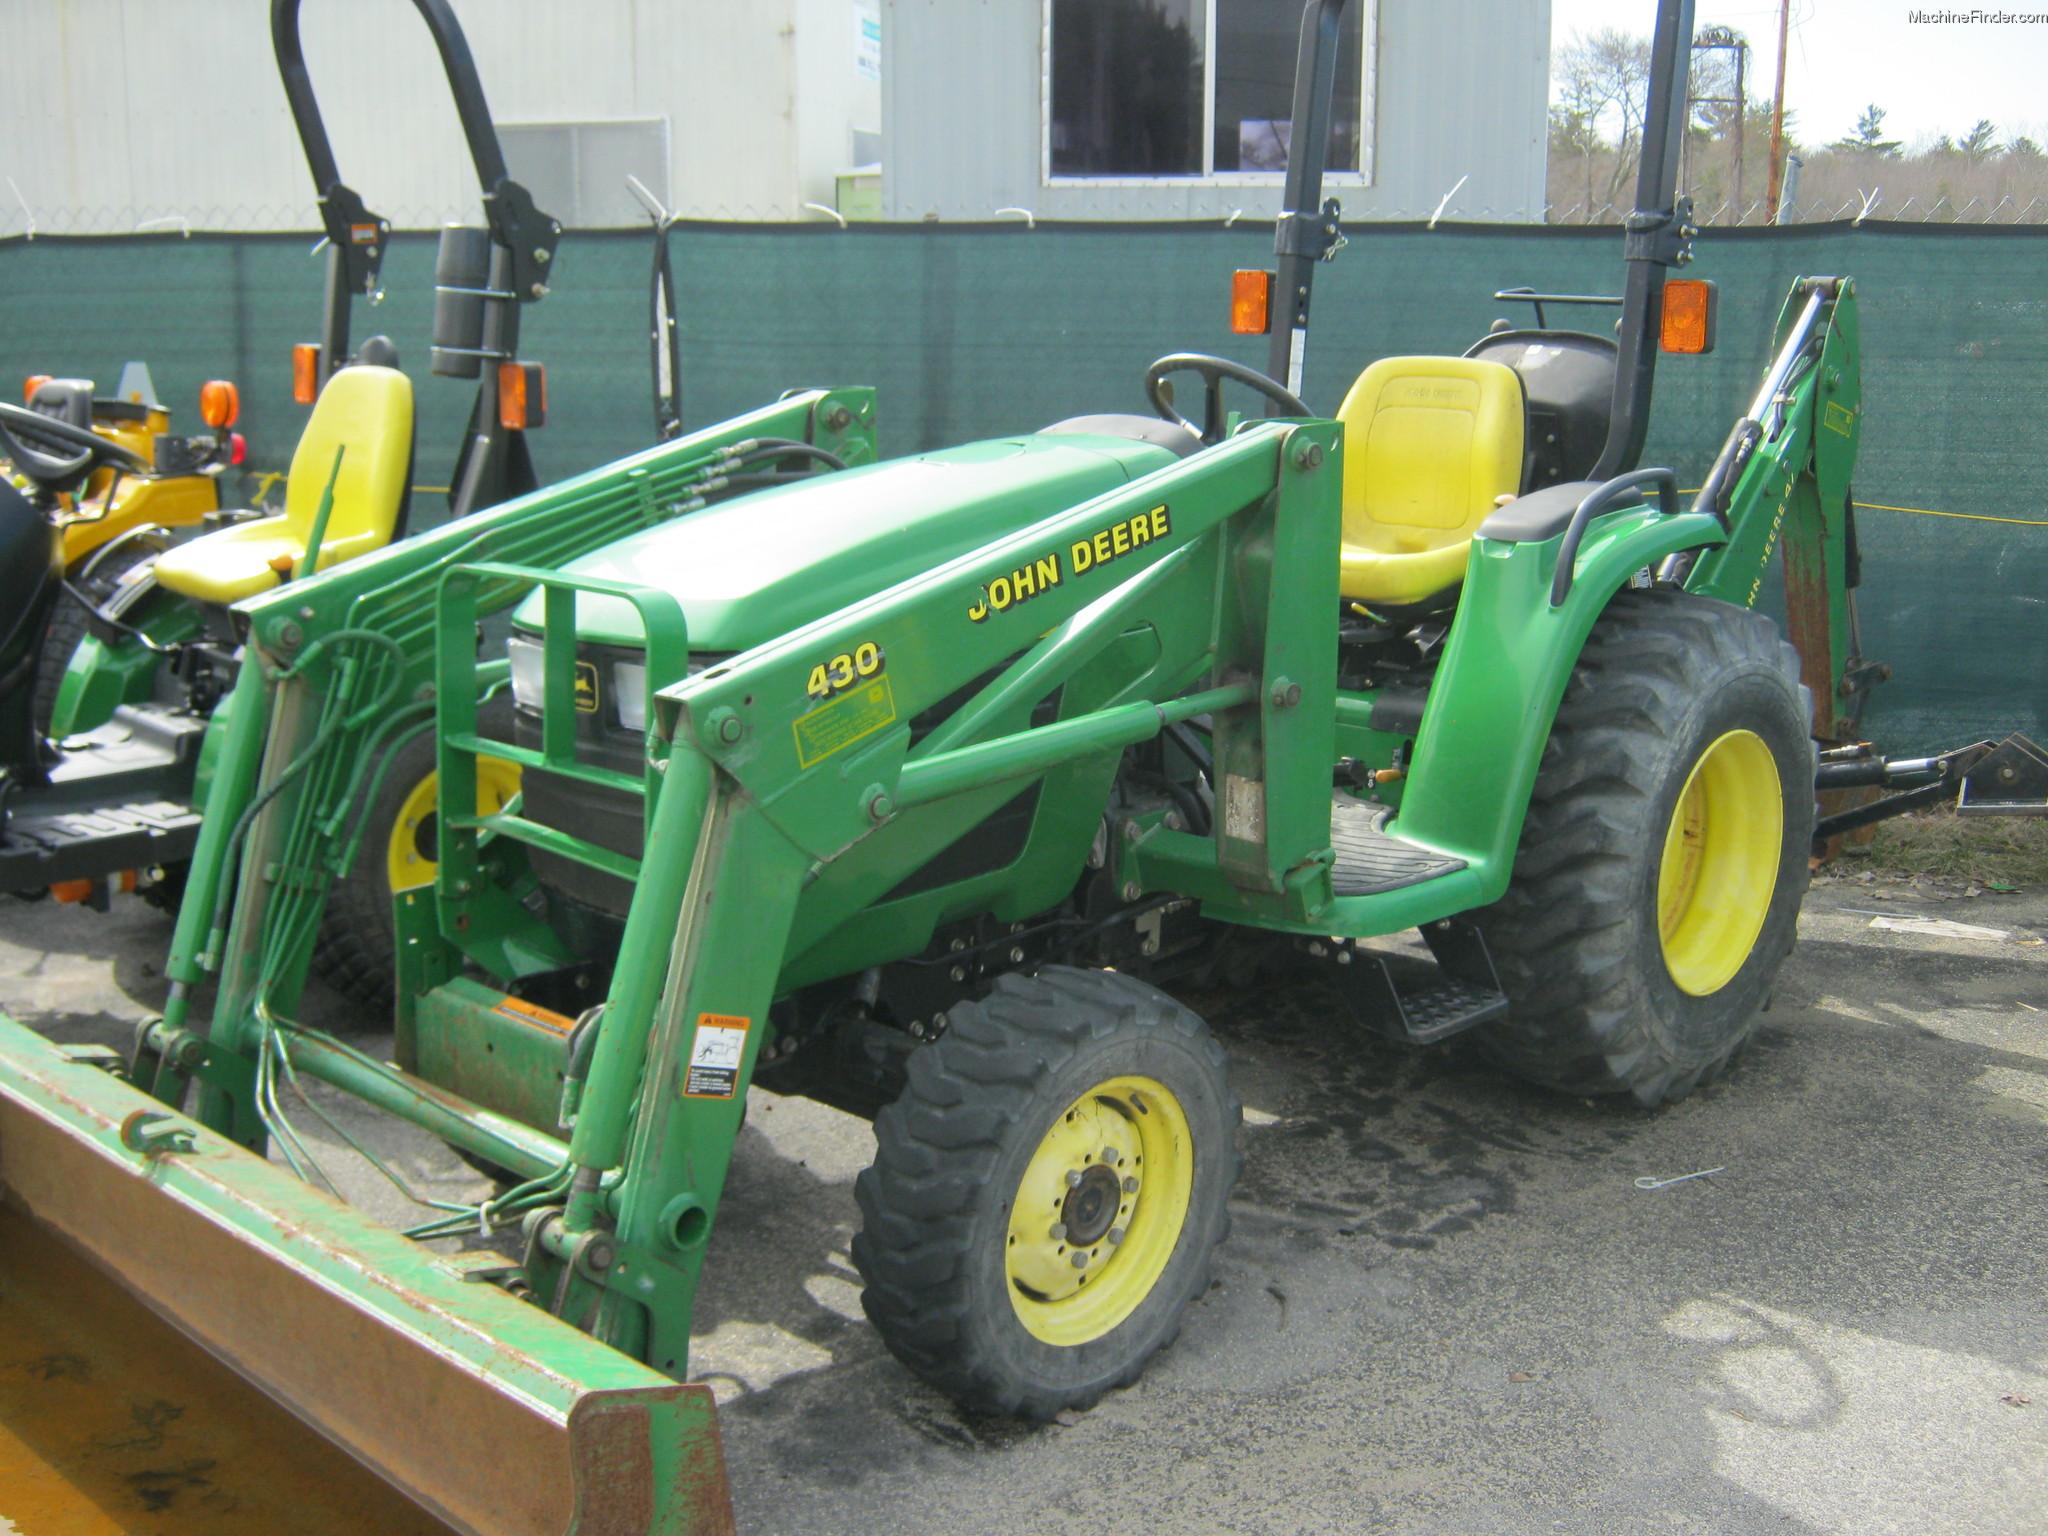 2001 John Deere 4300 Tractors - Compact (1-40hp.) - John ...